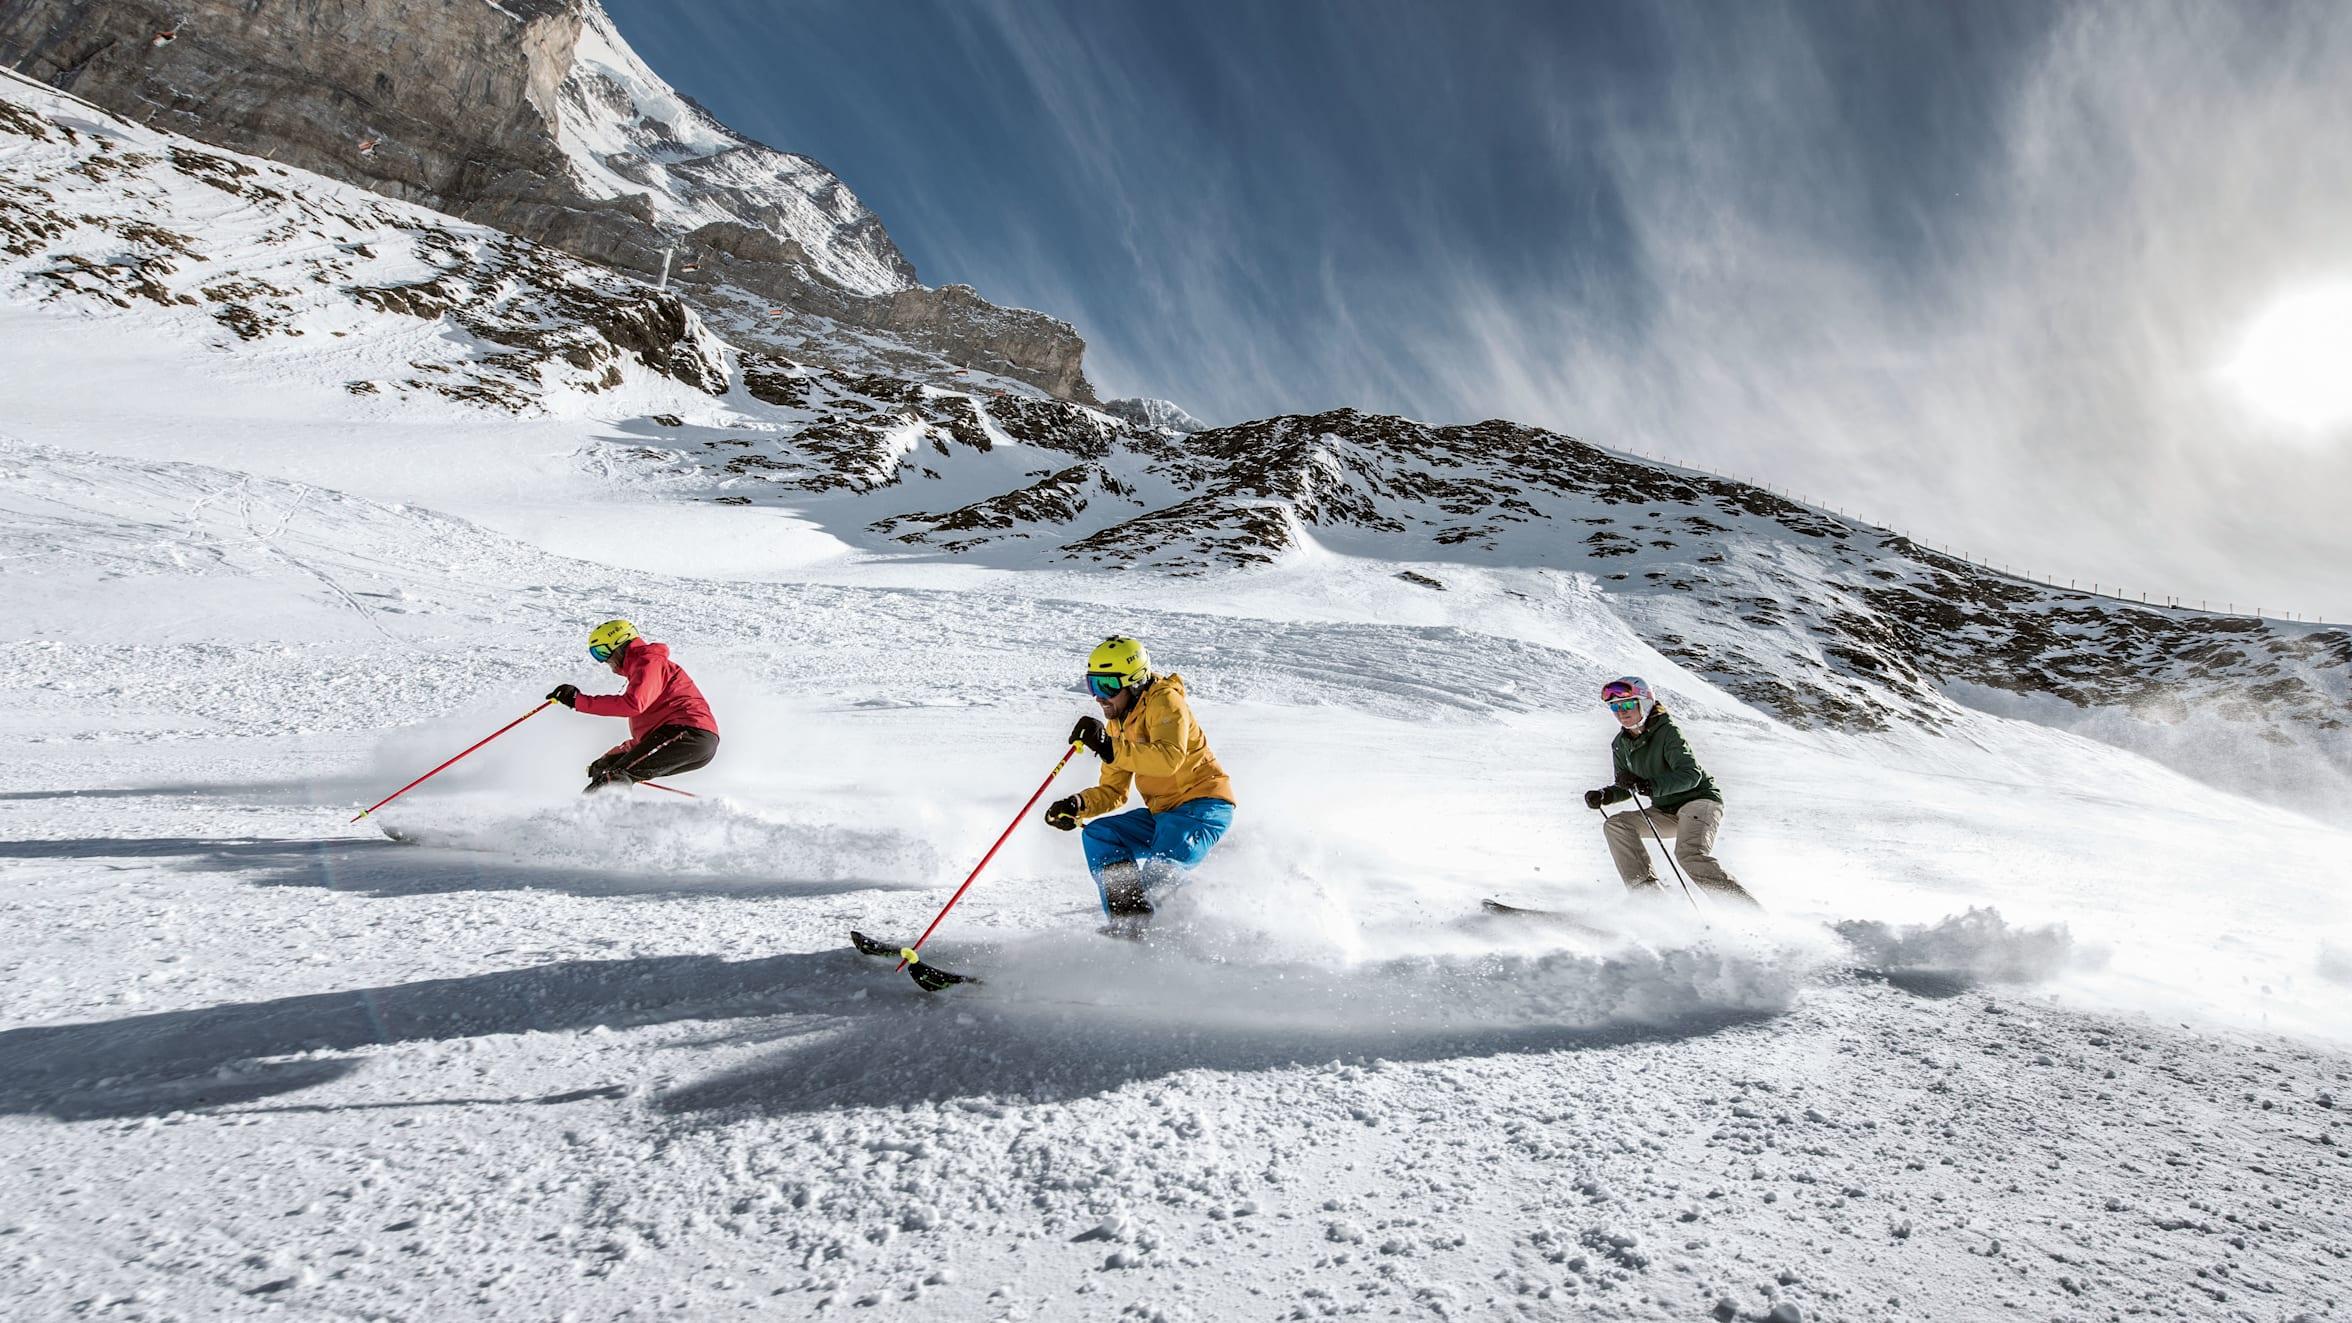 Jungfrau ski region Grindelwald Wengen friends ski